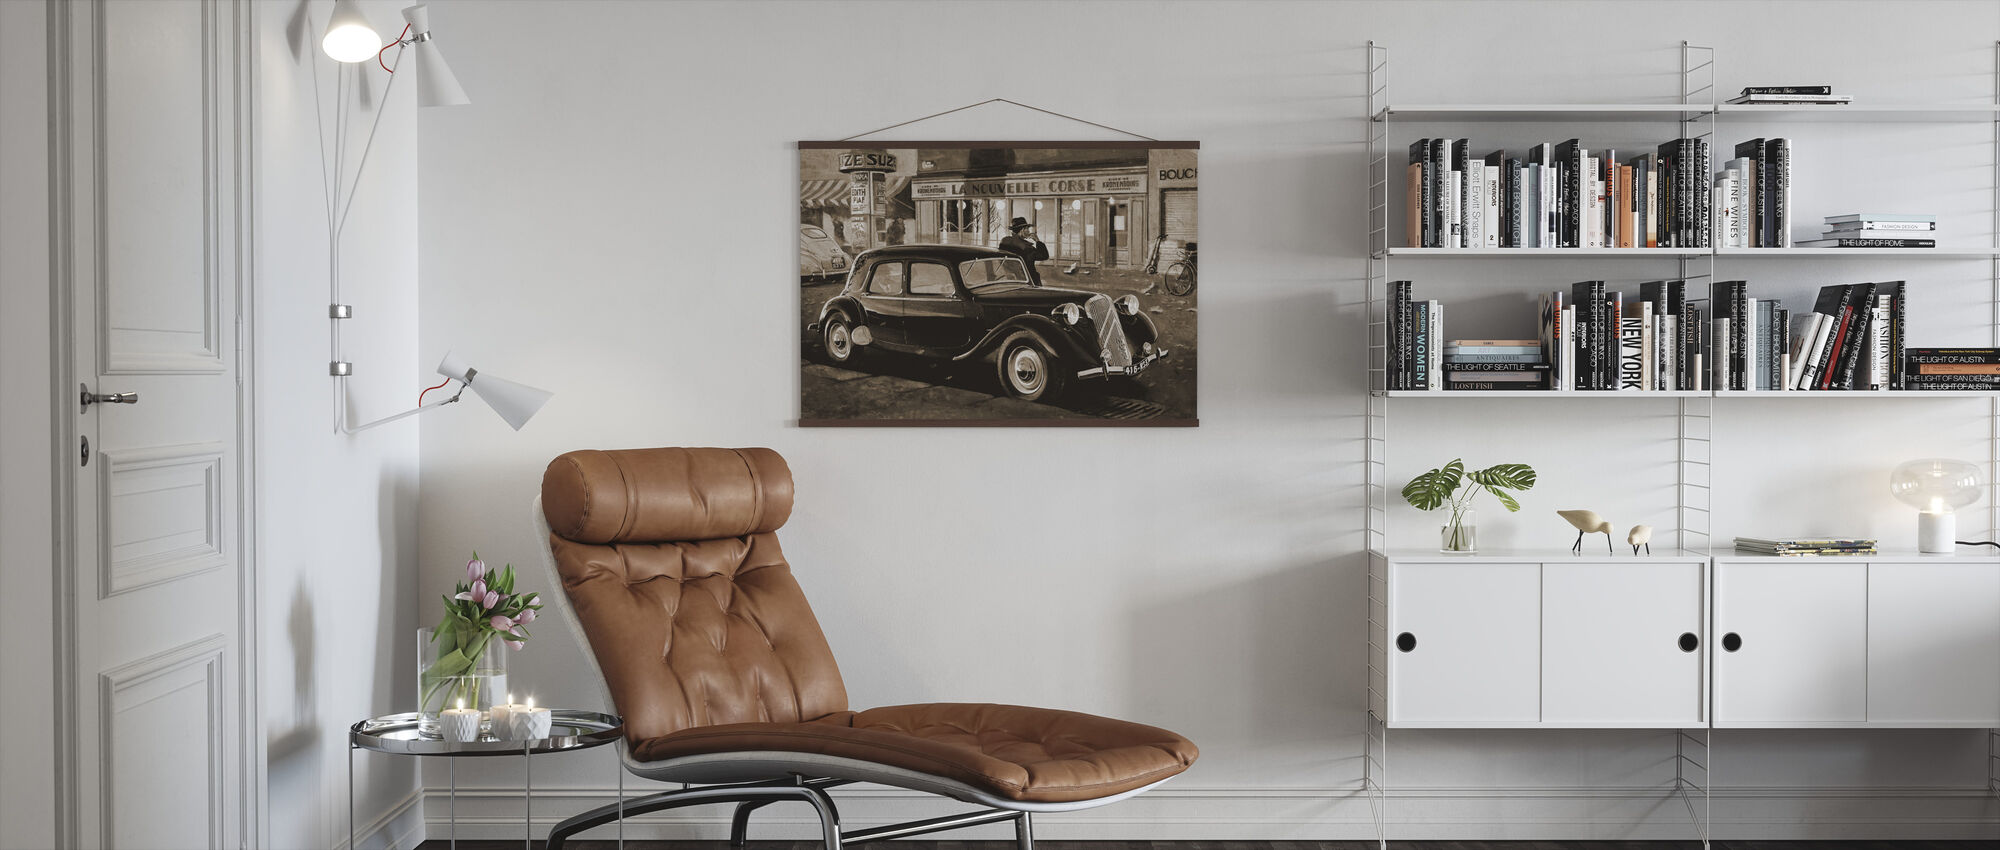 B15 in Paris Sepia - Poster - Living Room